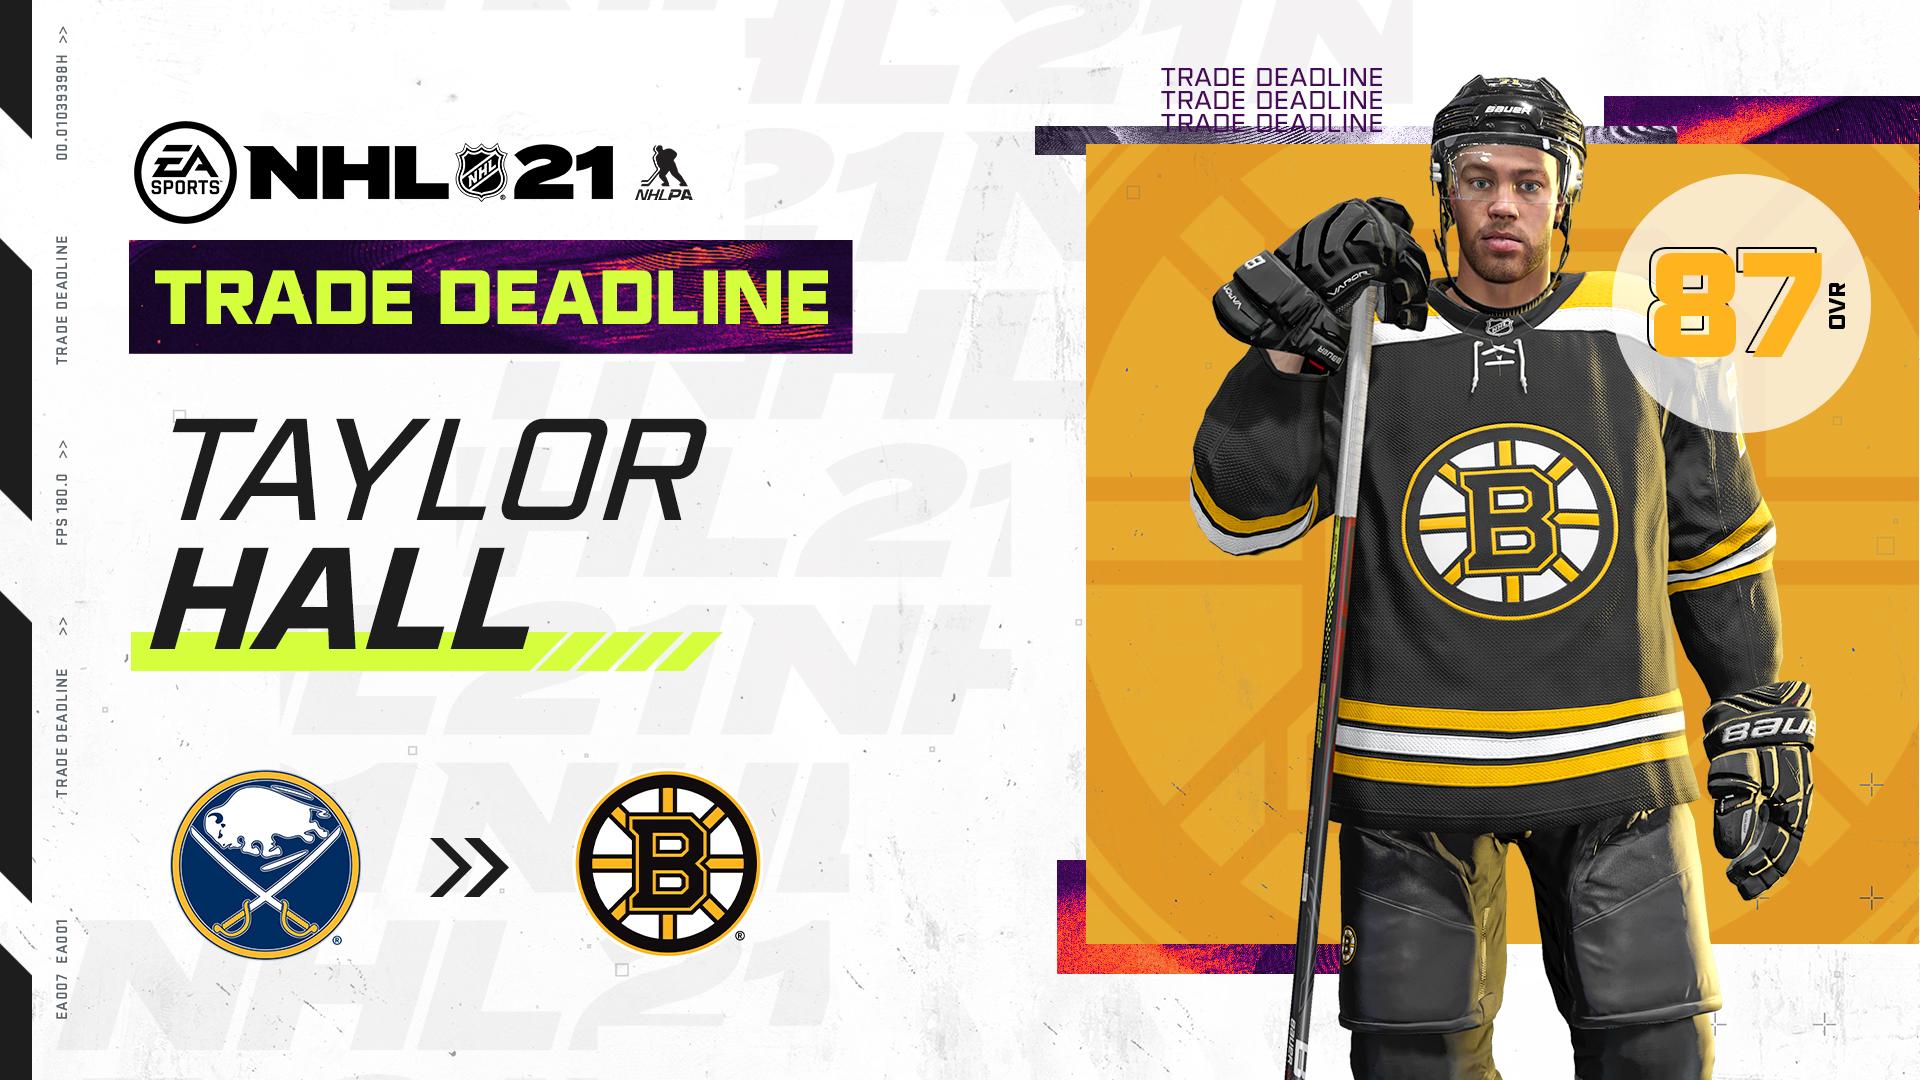 NHL 21 trade deadline - 4